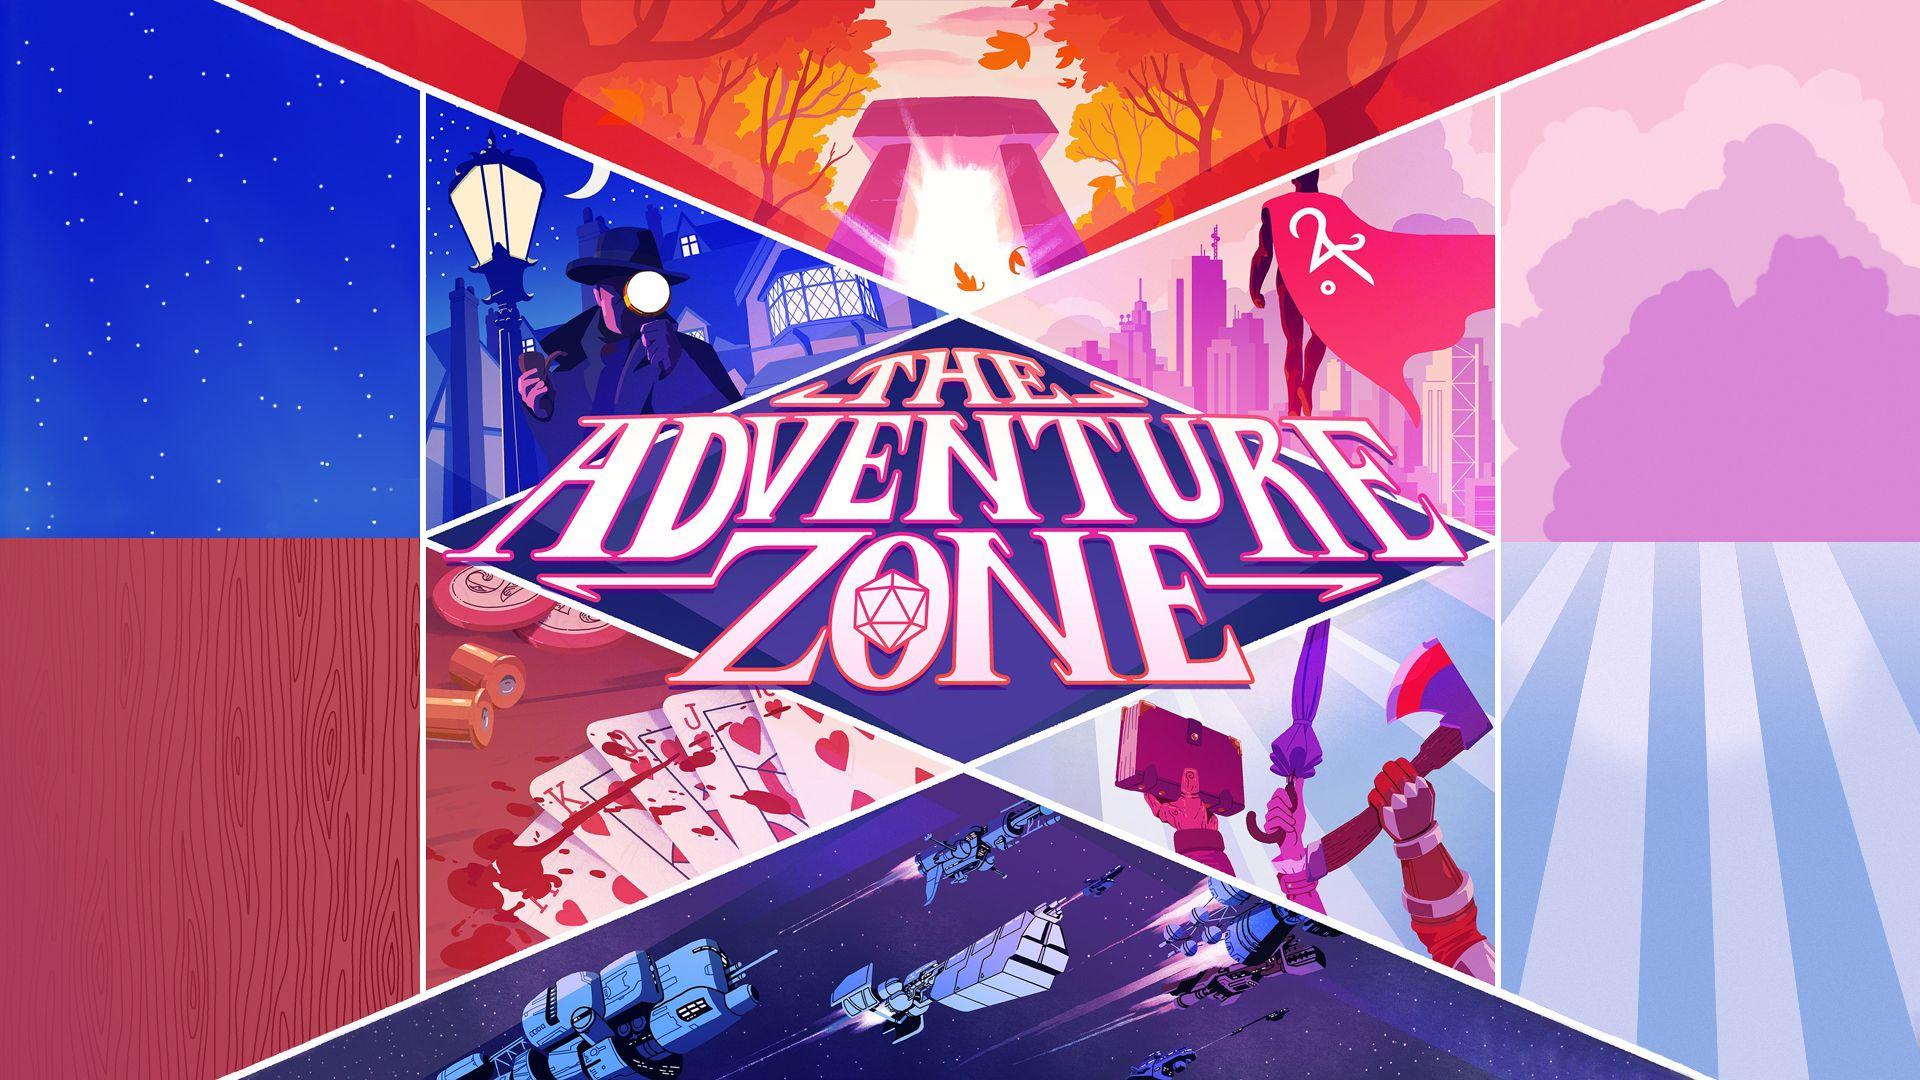 The Adventure Zone   Wallpaper Edition [1920x1080] Fan Board 1920x1080